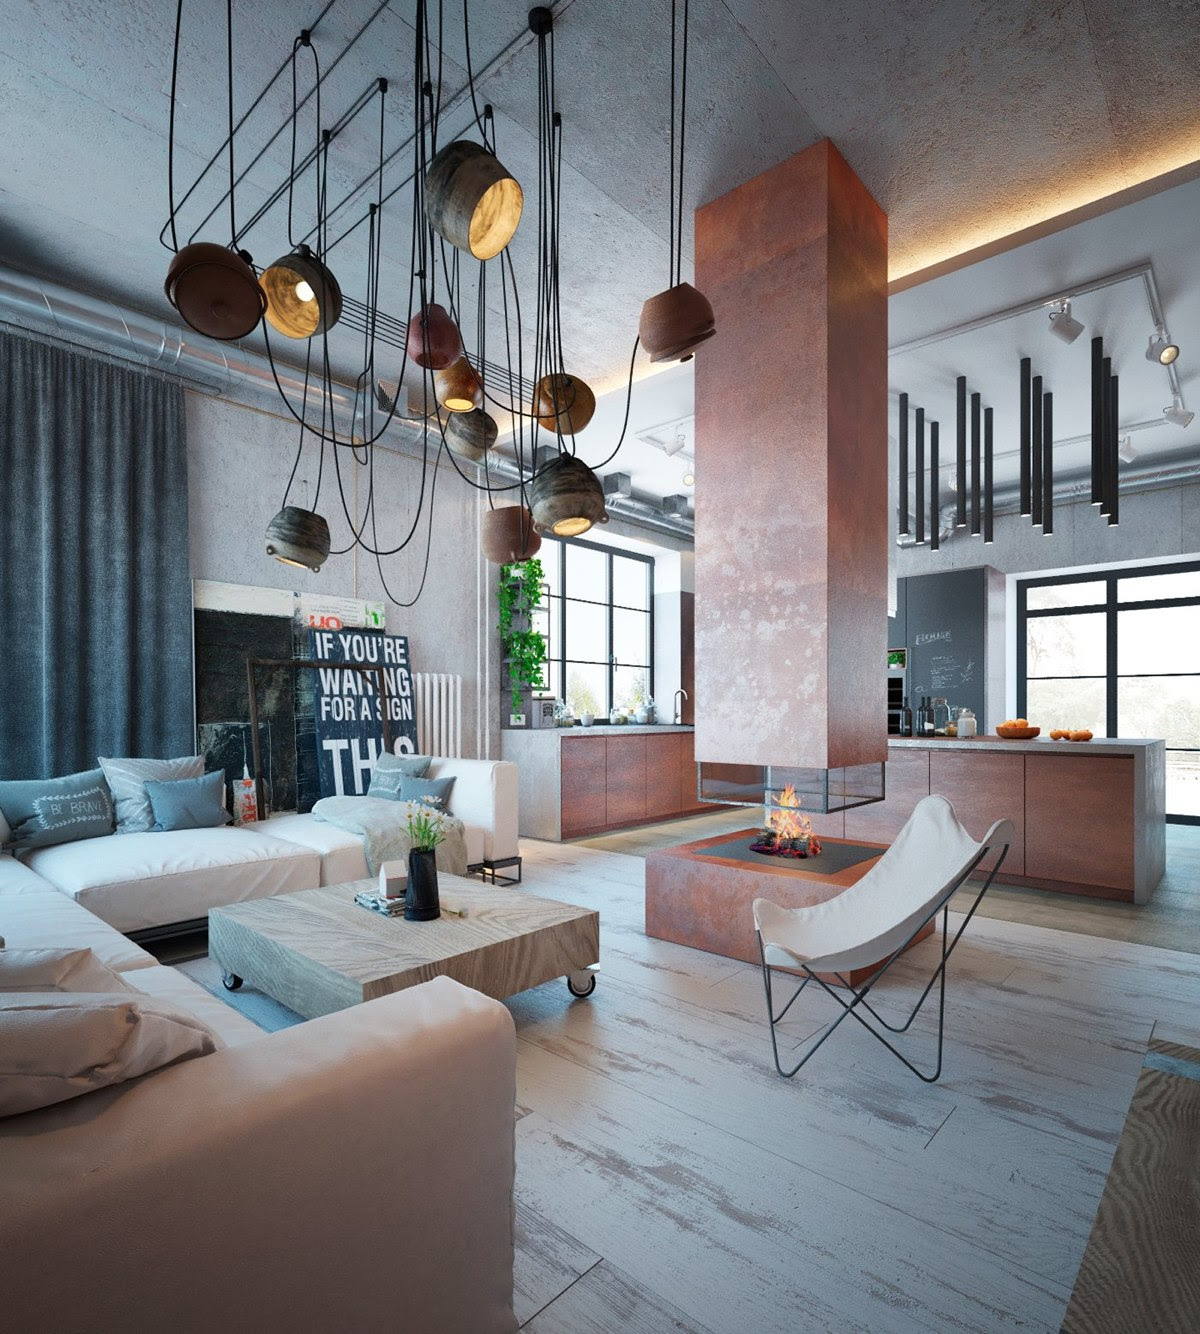 Home Ideas - Modern Home Design: Industrial Interior Design